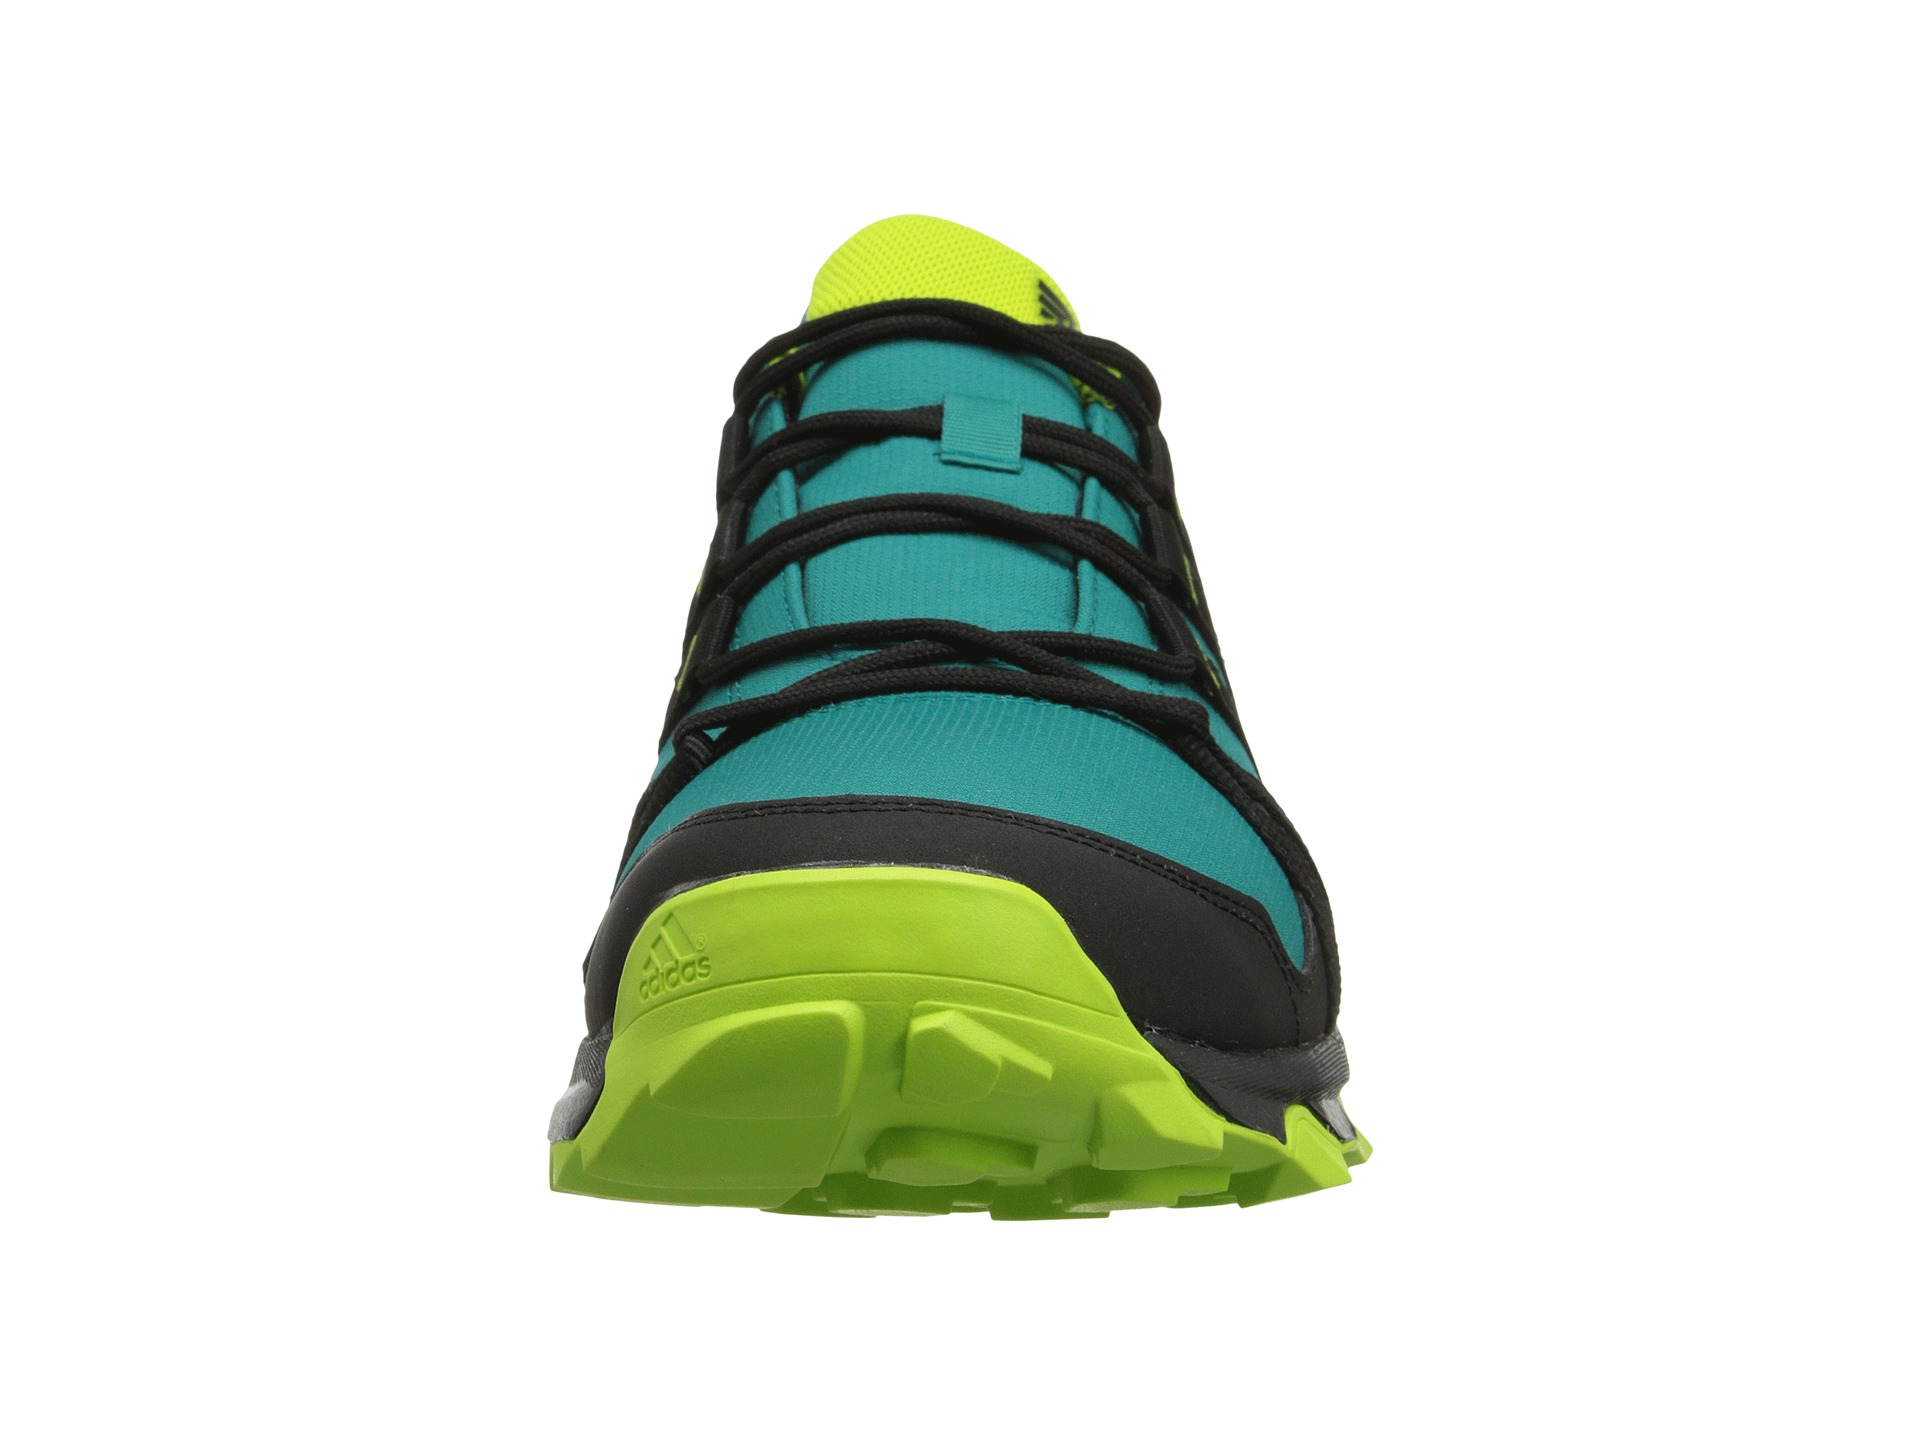 Lyst - Adidas Originals Trace Rocker in Blue for Men 0ba2af0a6f80